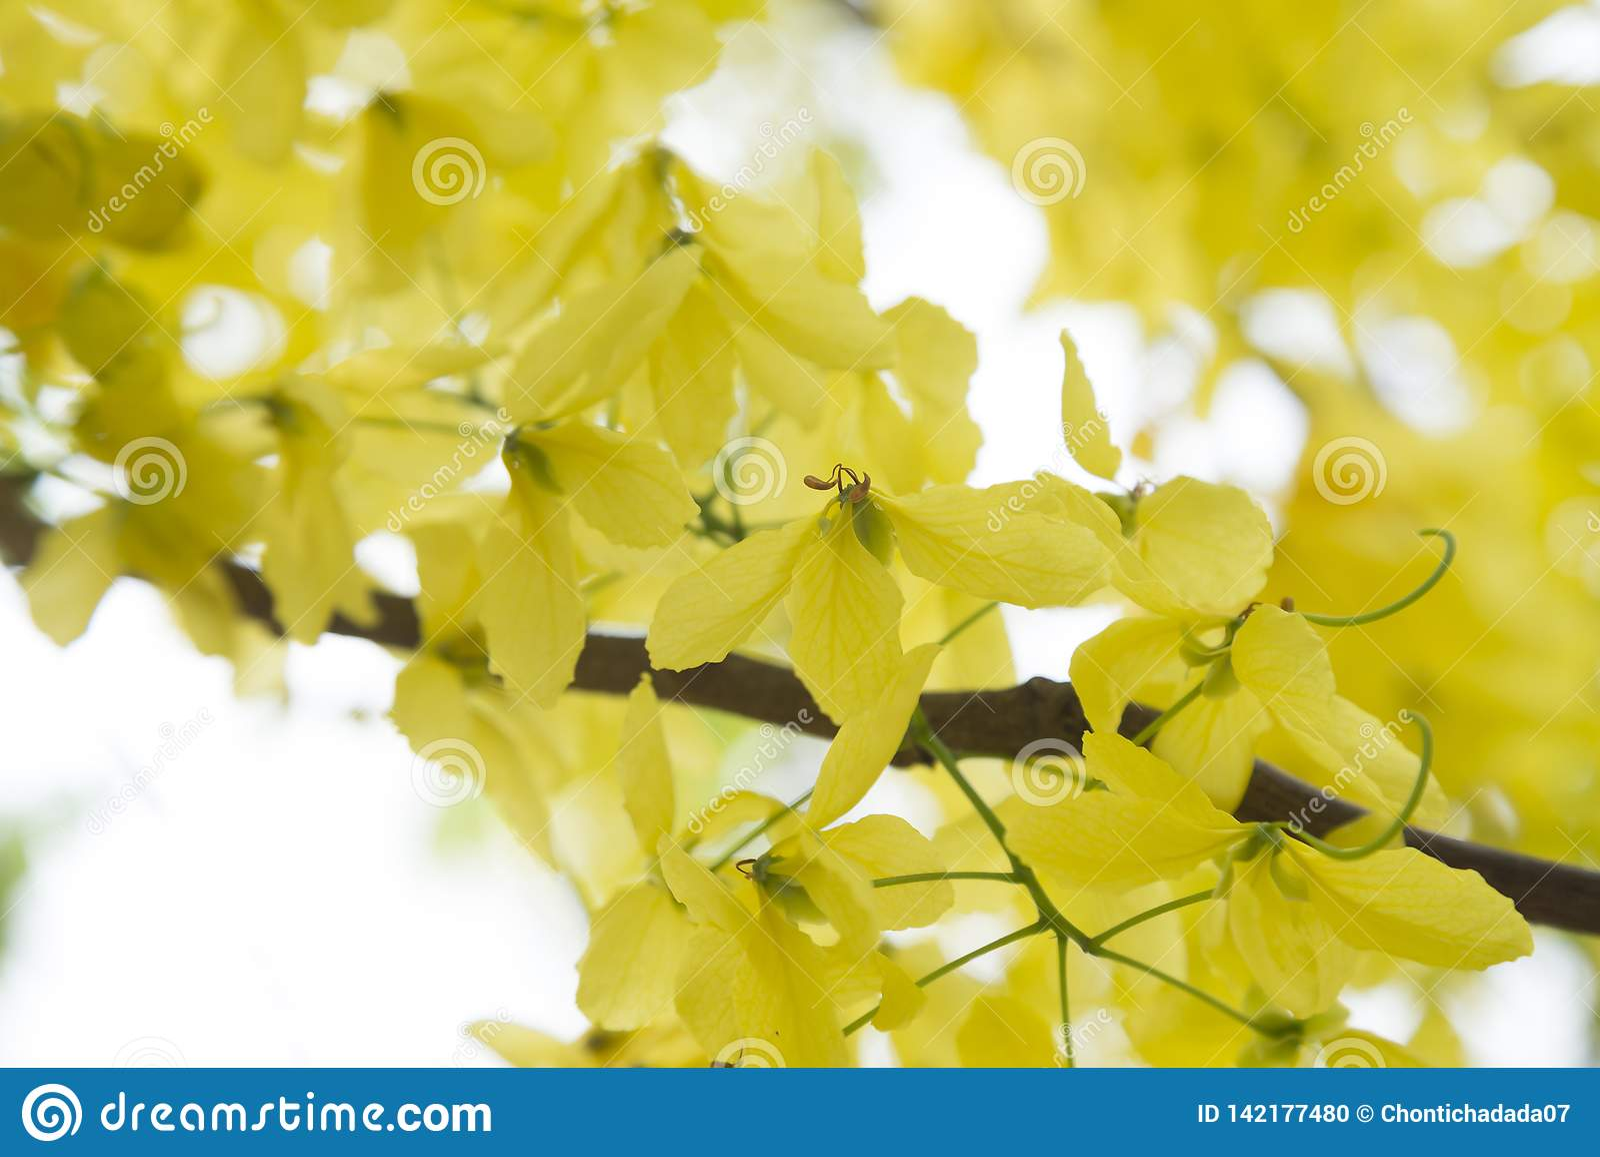 Golden Shower TreeCassia fistula is beauty yellow flower  in summer